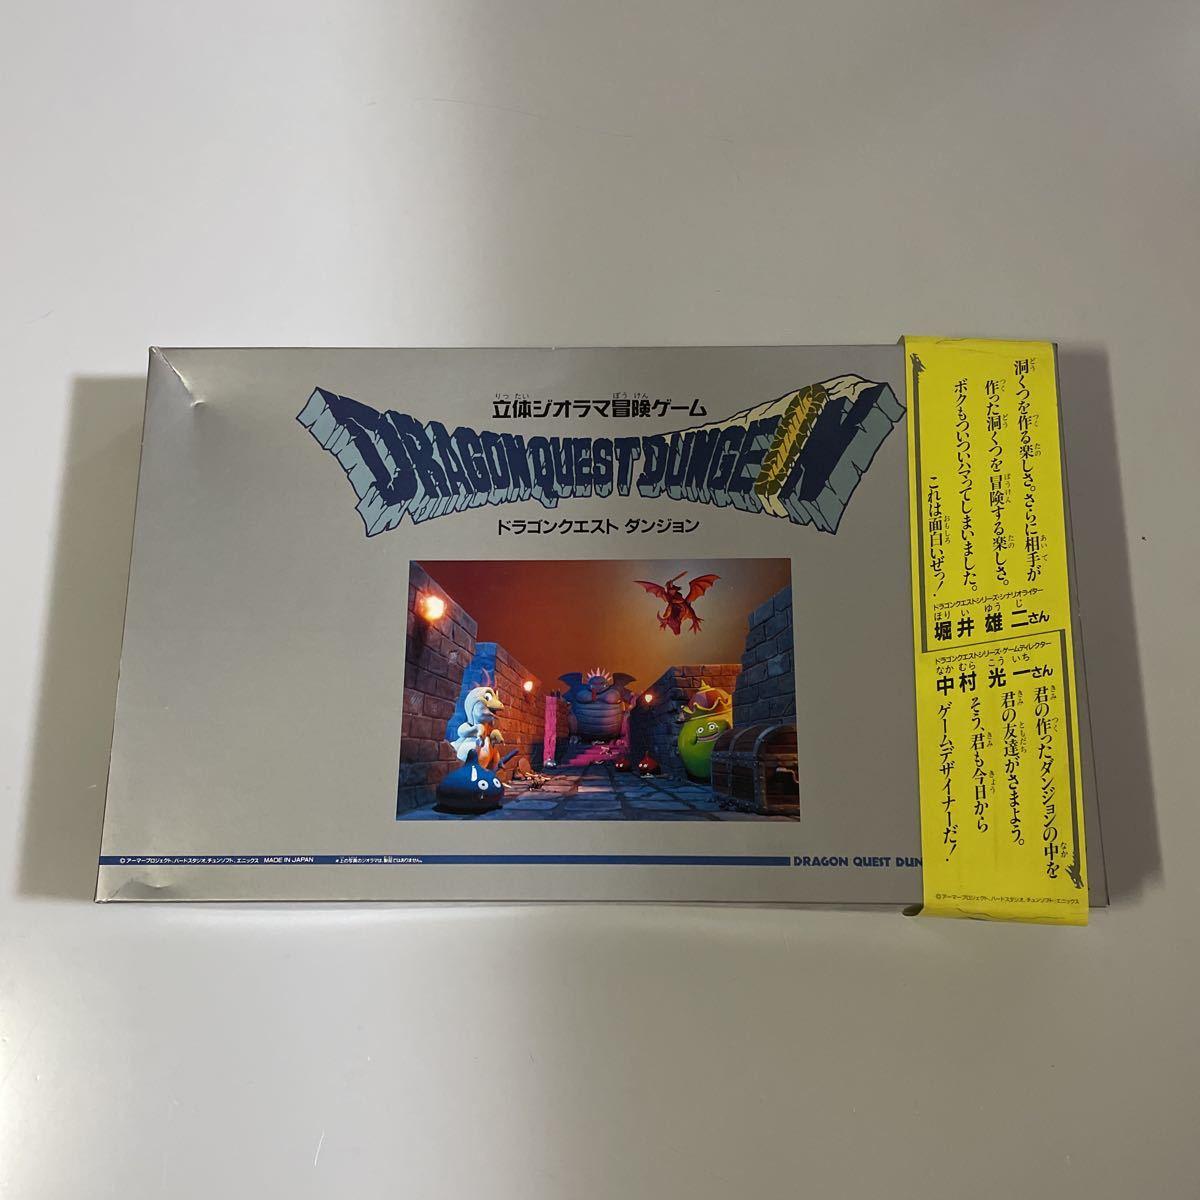 D456 ★希少 エニックス ドラゴンクエスト ダンジョン 当時物 立体ジオラマ冒険ゲーム ボードゲーム デッドストック 未使用